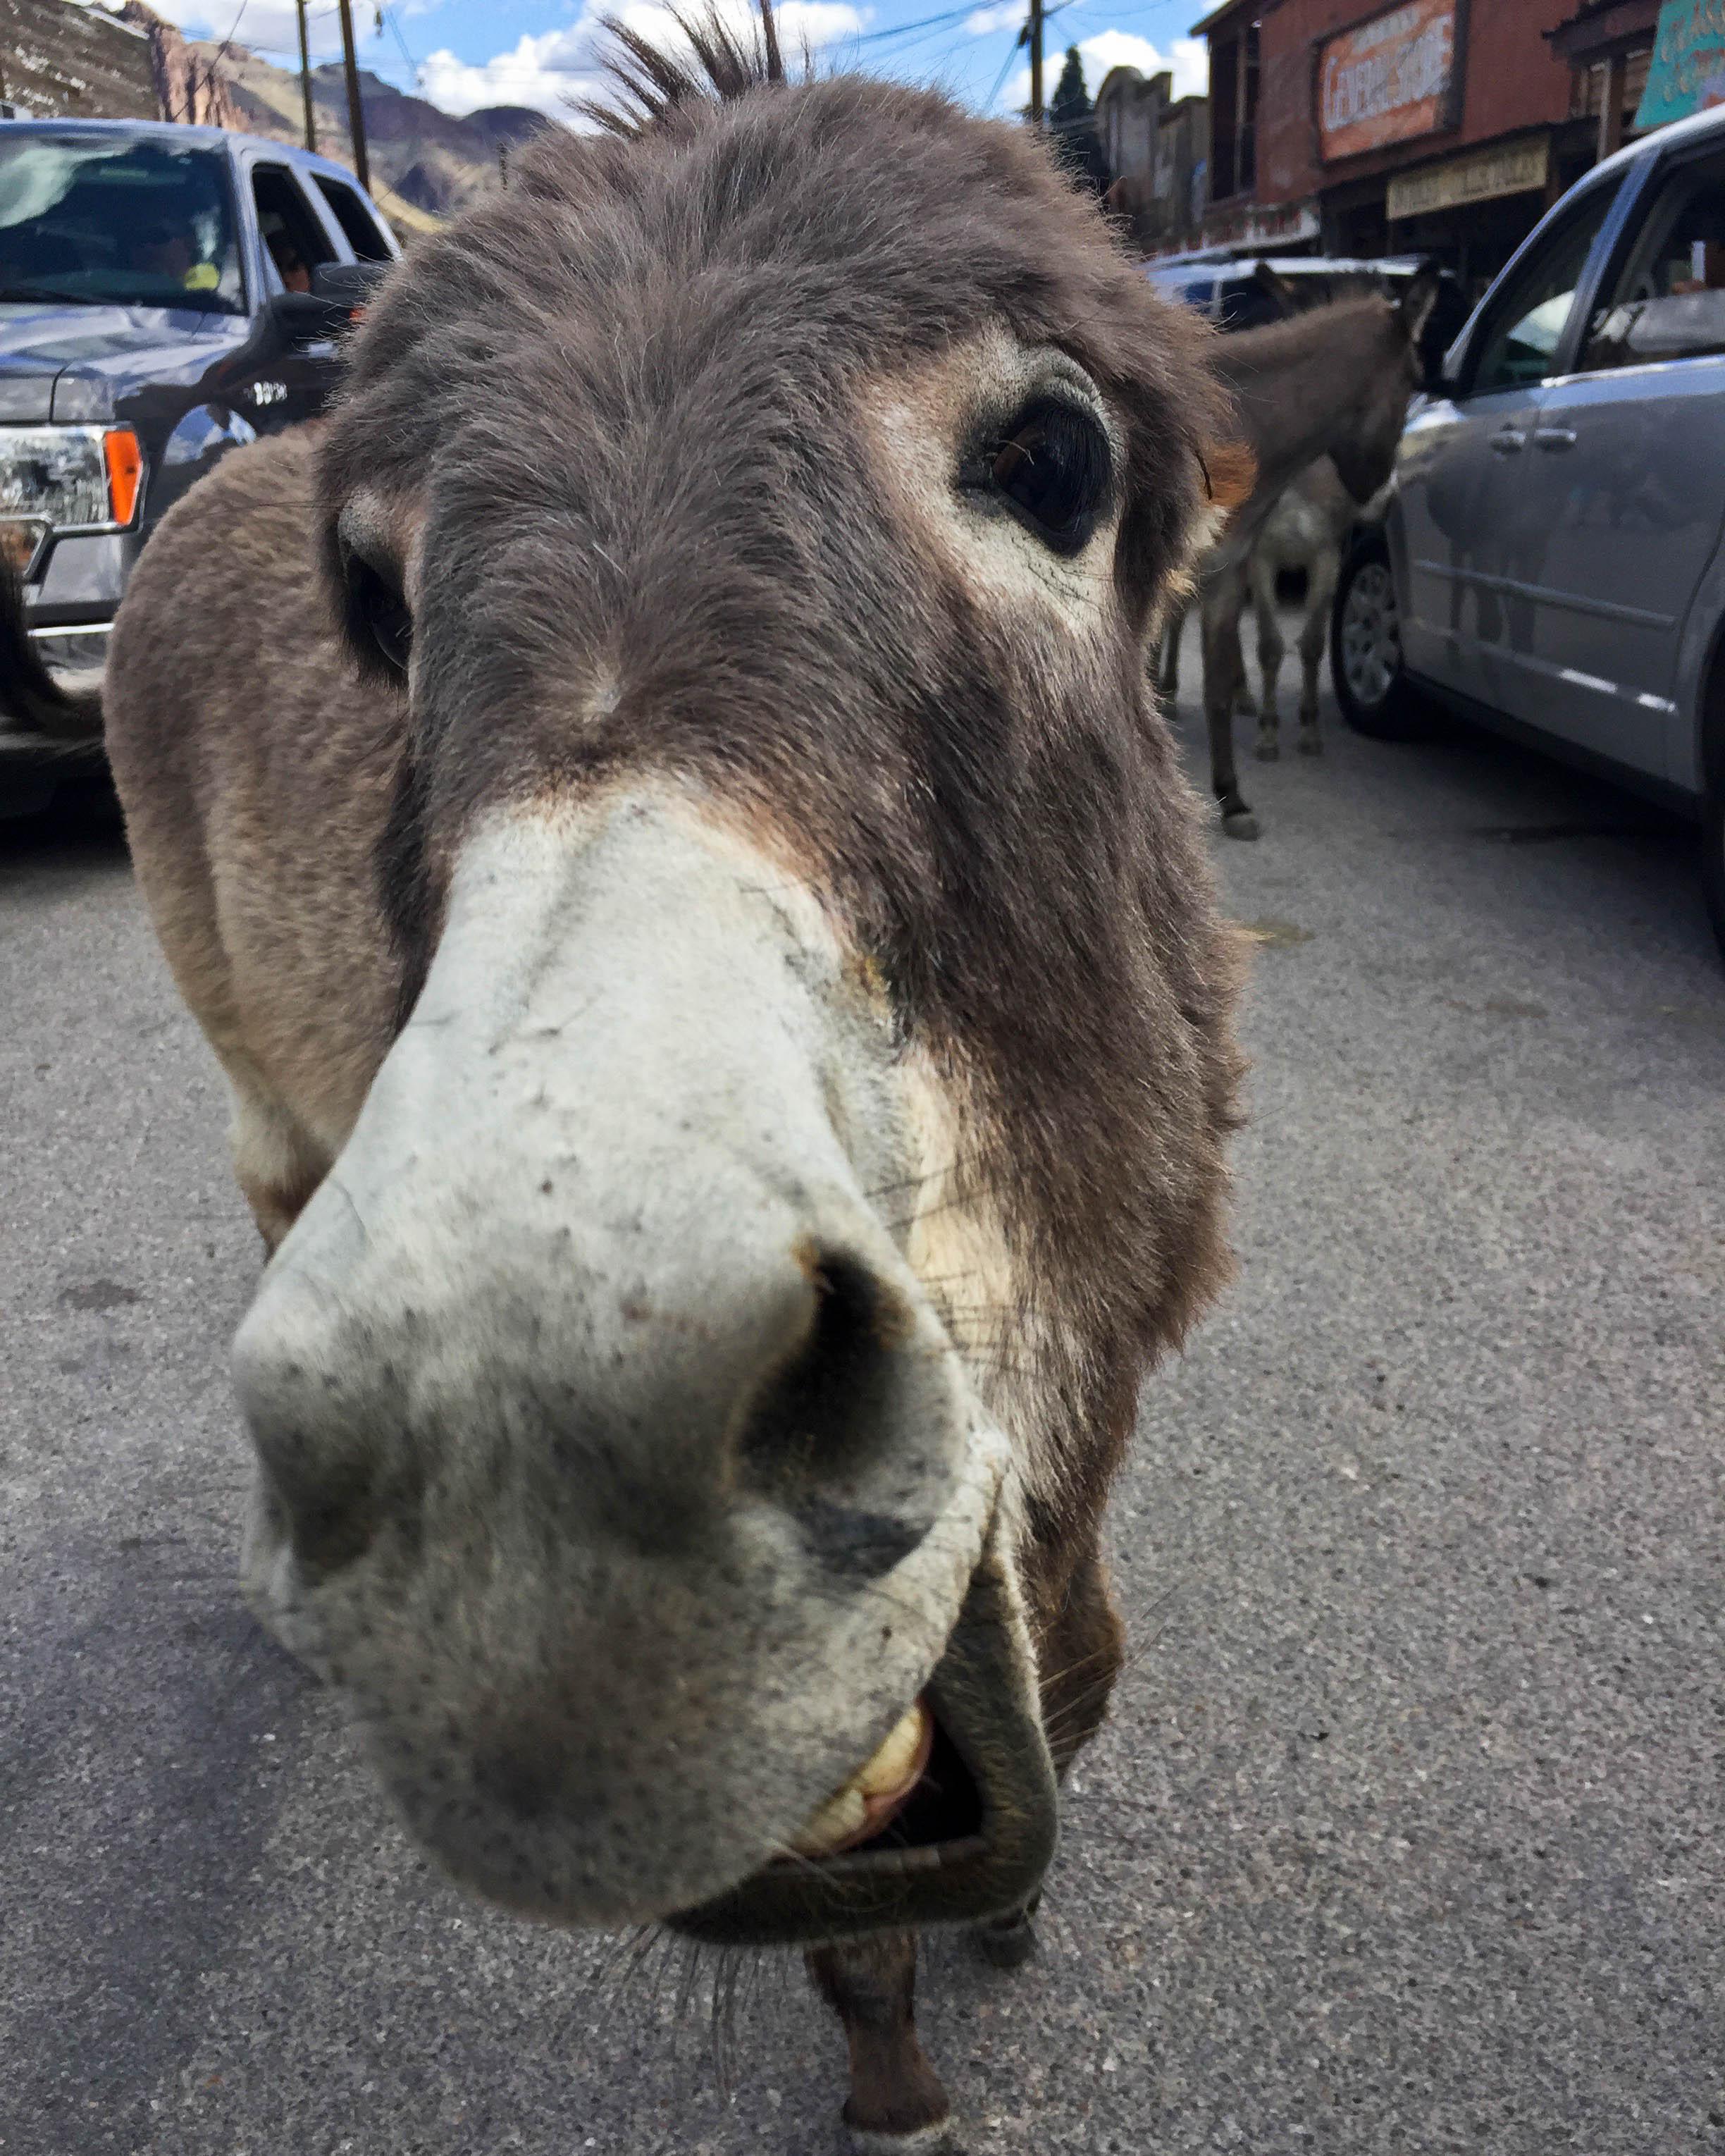 A donkey in Oatman, Arizona, reacts grumpily to having its photograph taken. 2017.